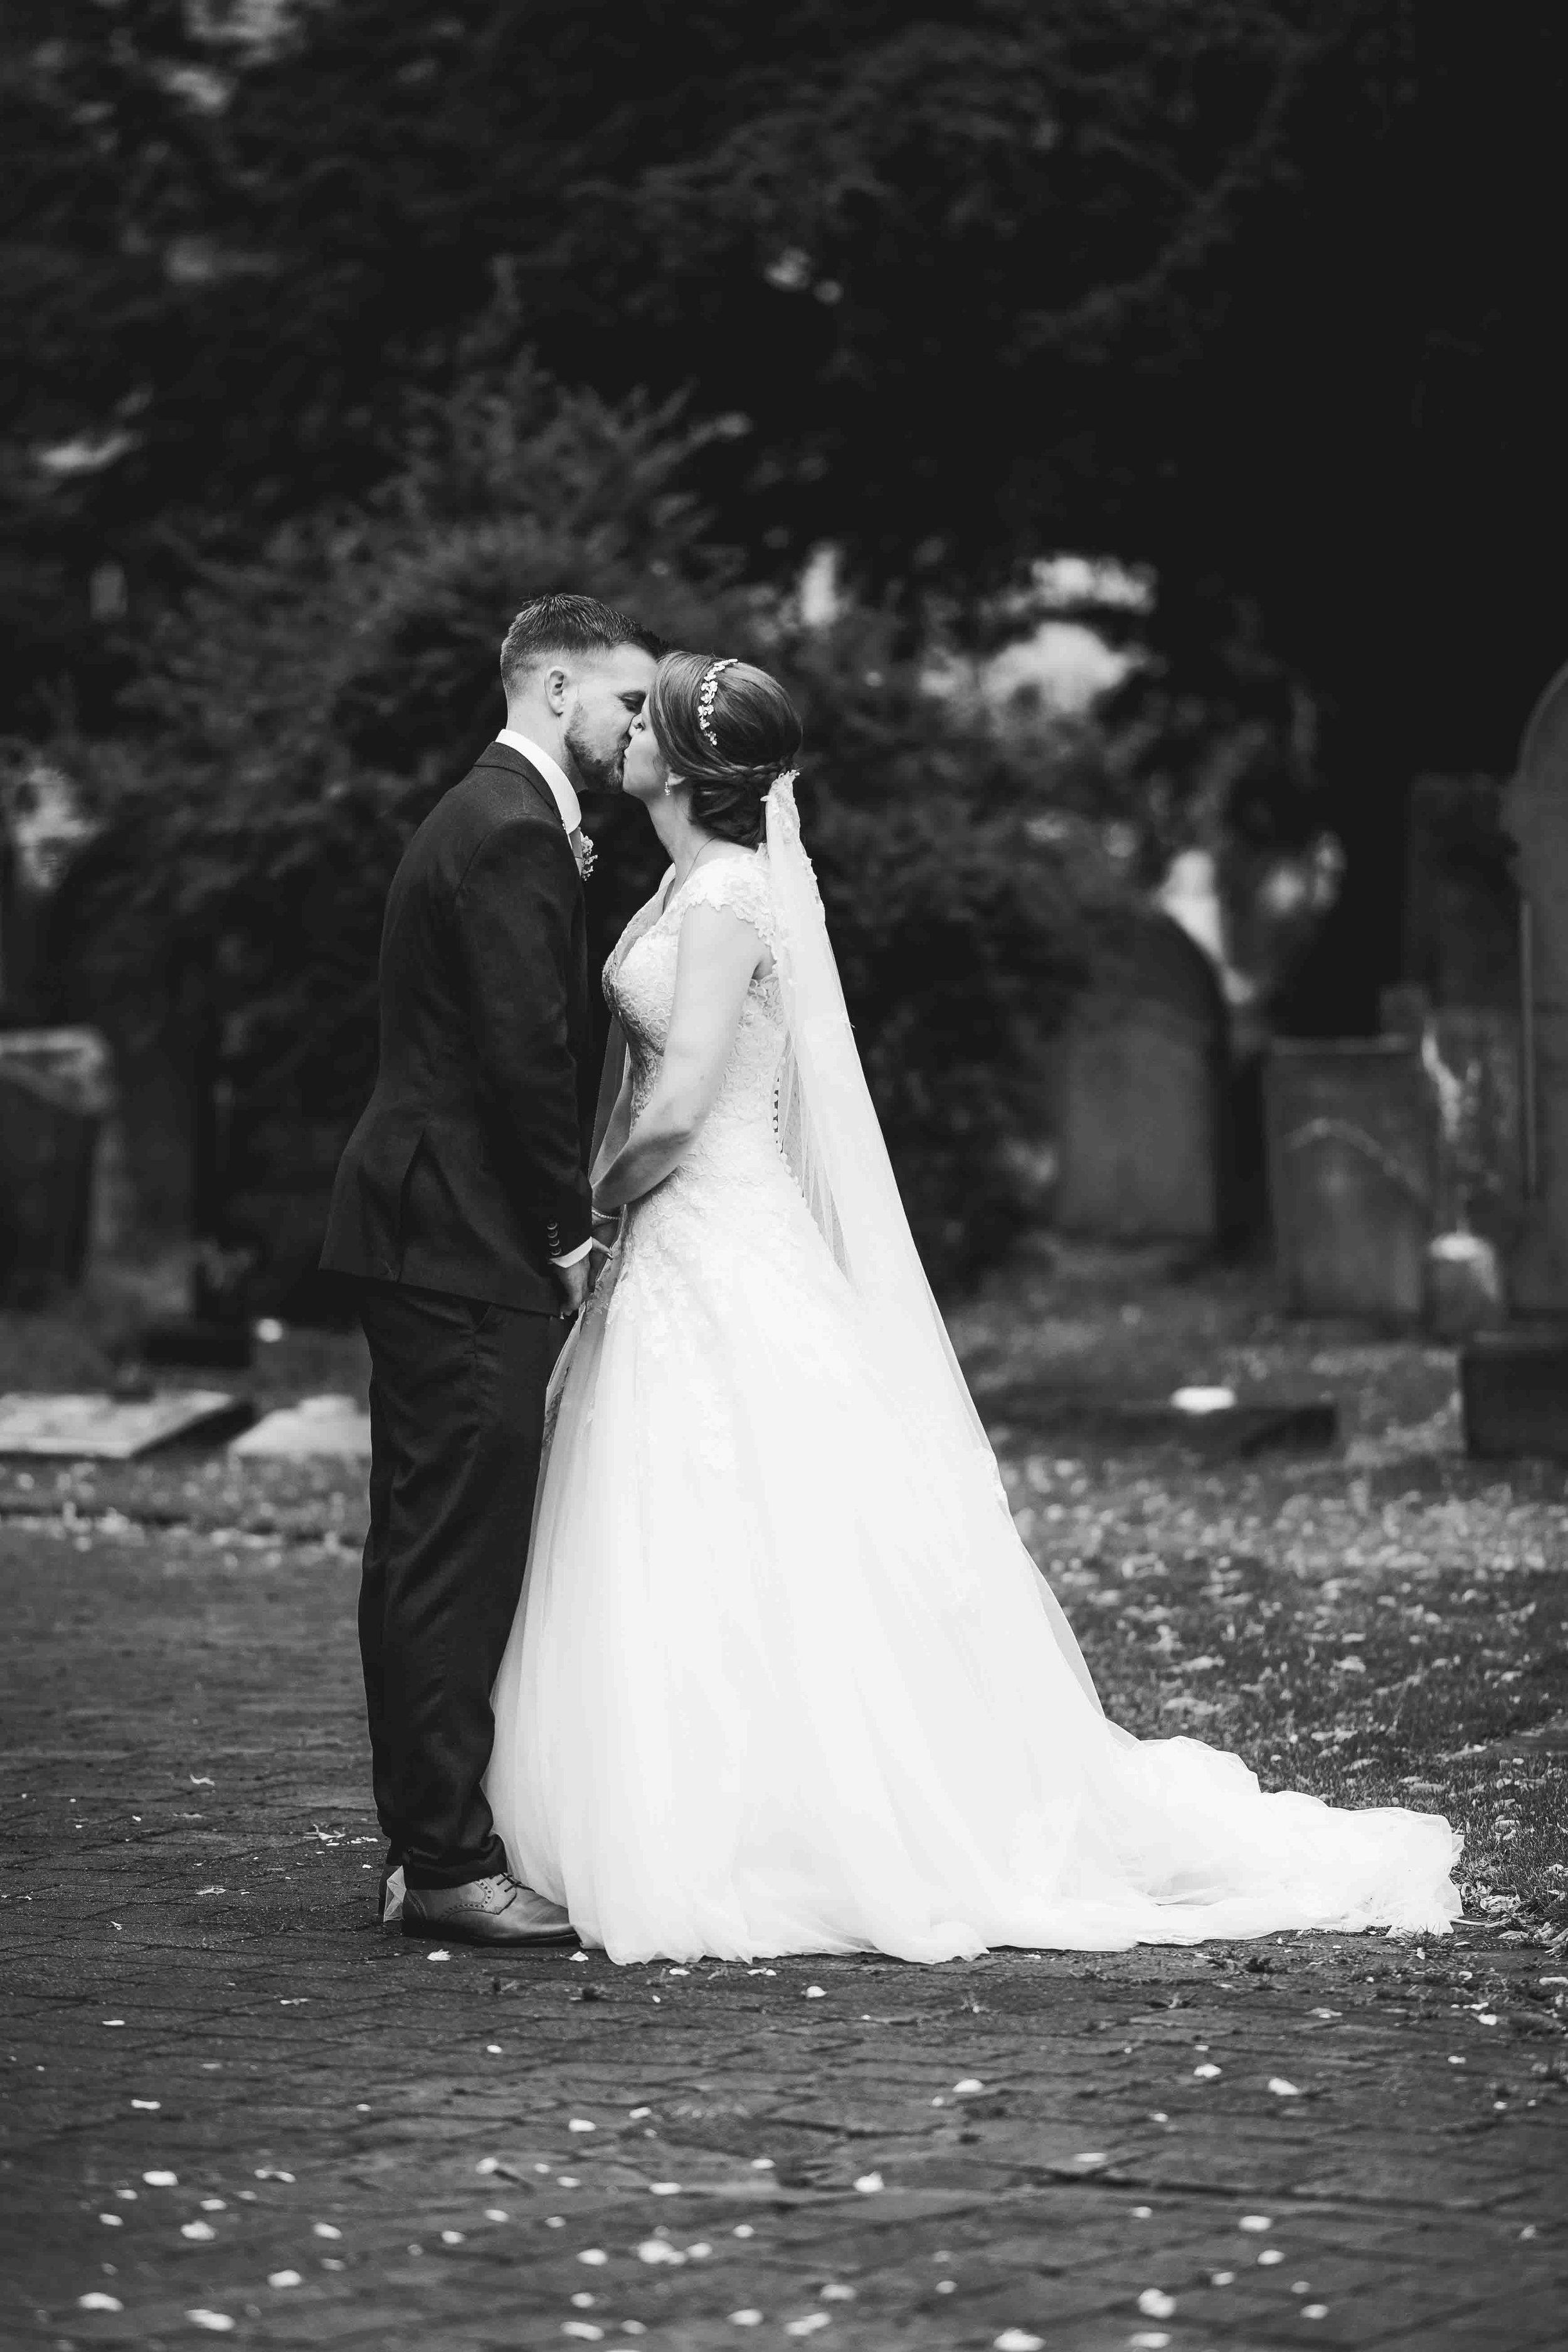 Lea-cooper-photography-willenhall-wolverhampton-wedding-photographer-birmingham-shirley-west-midlands-ceremony-church-12.JPG